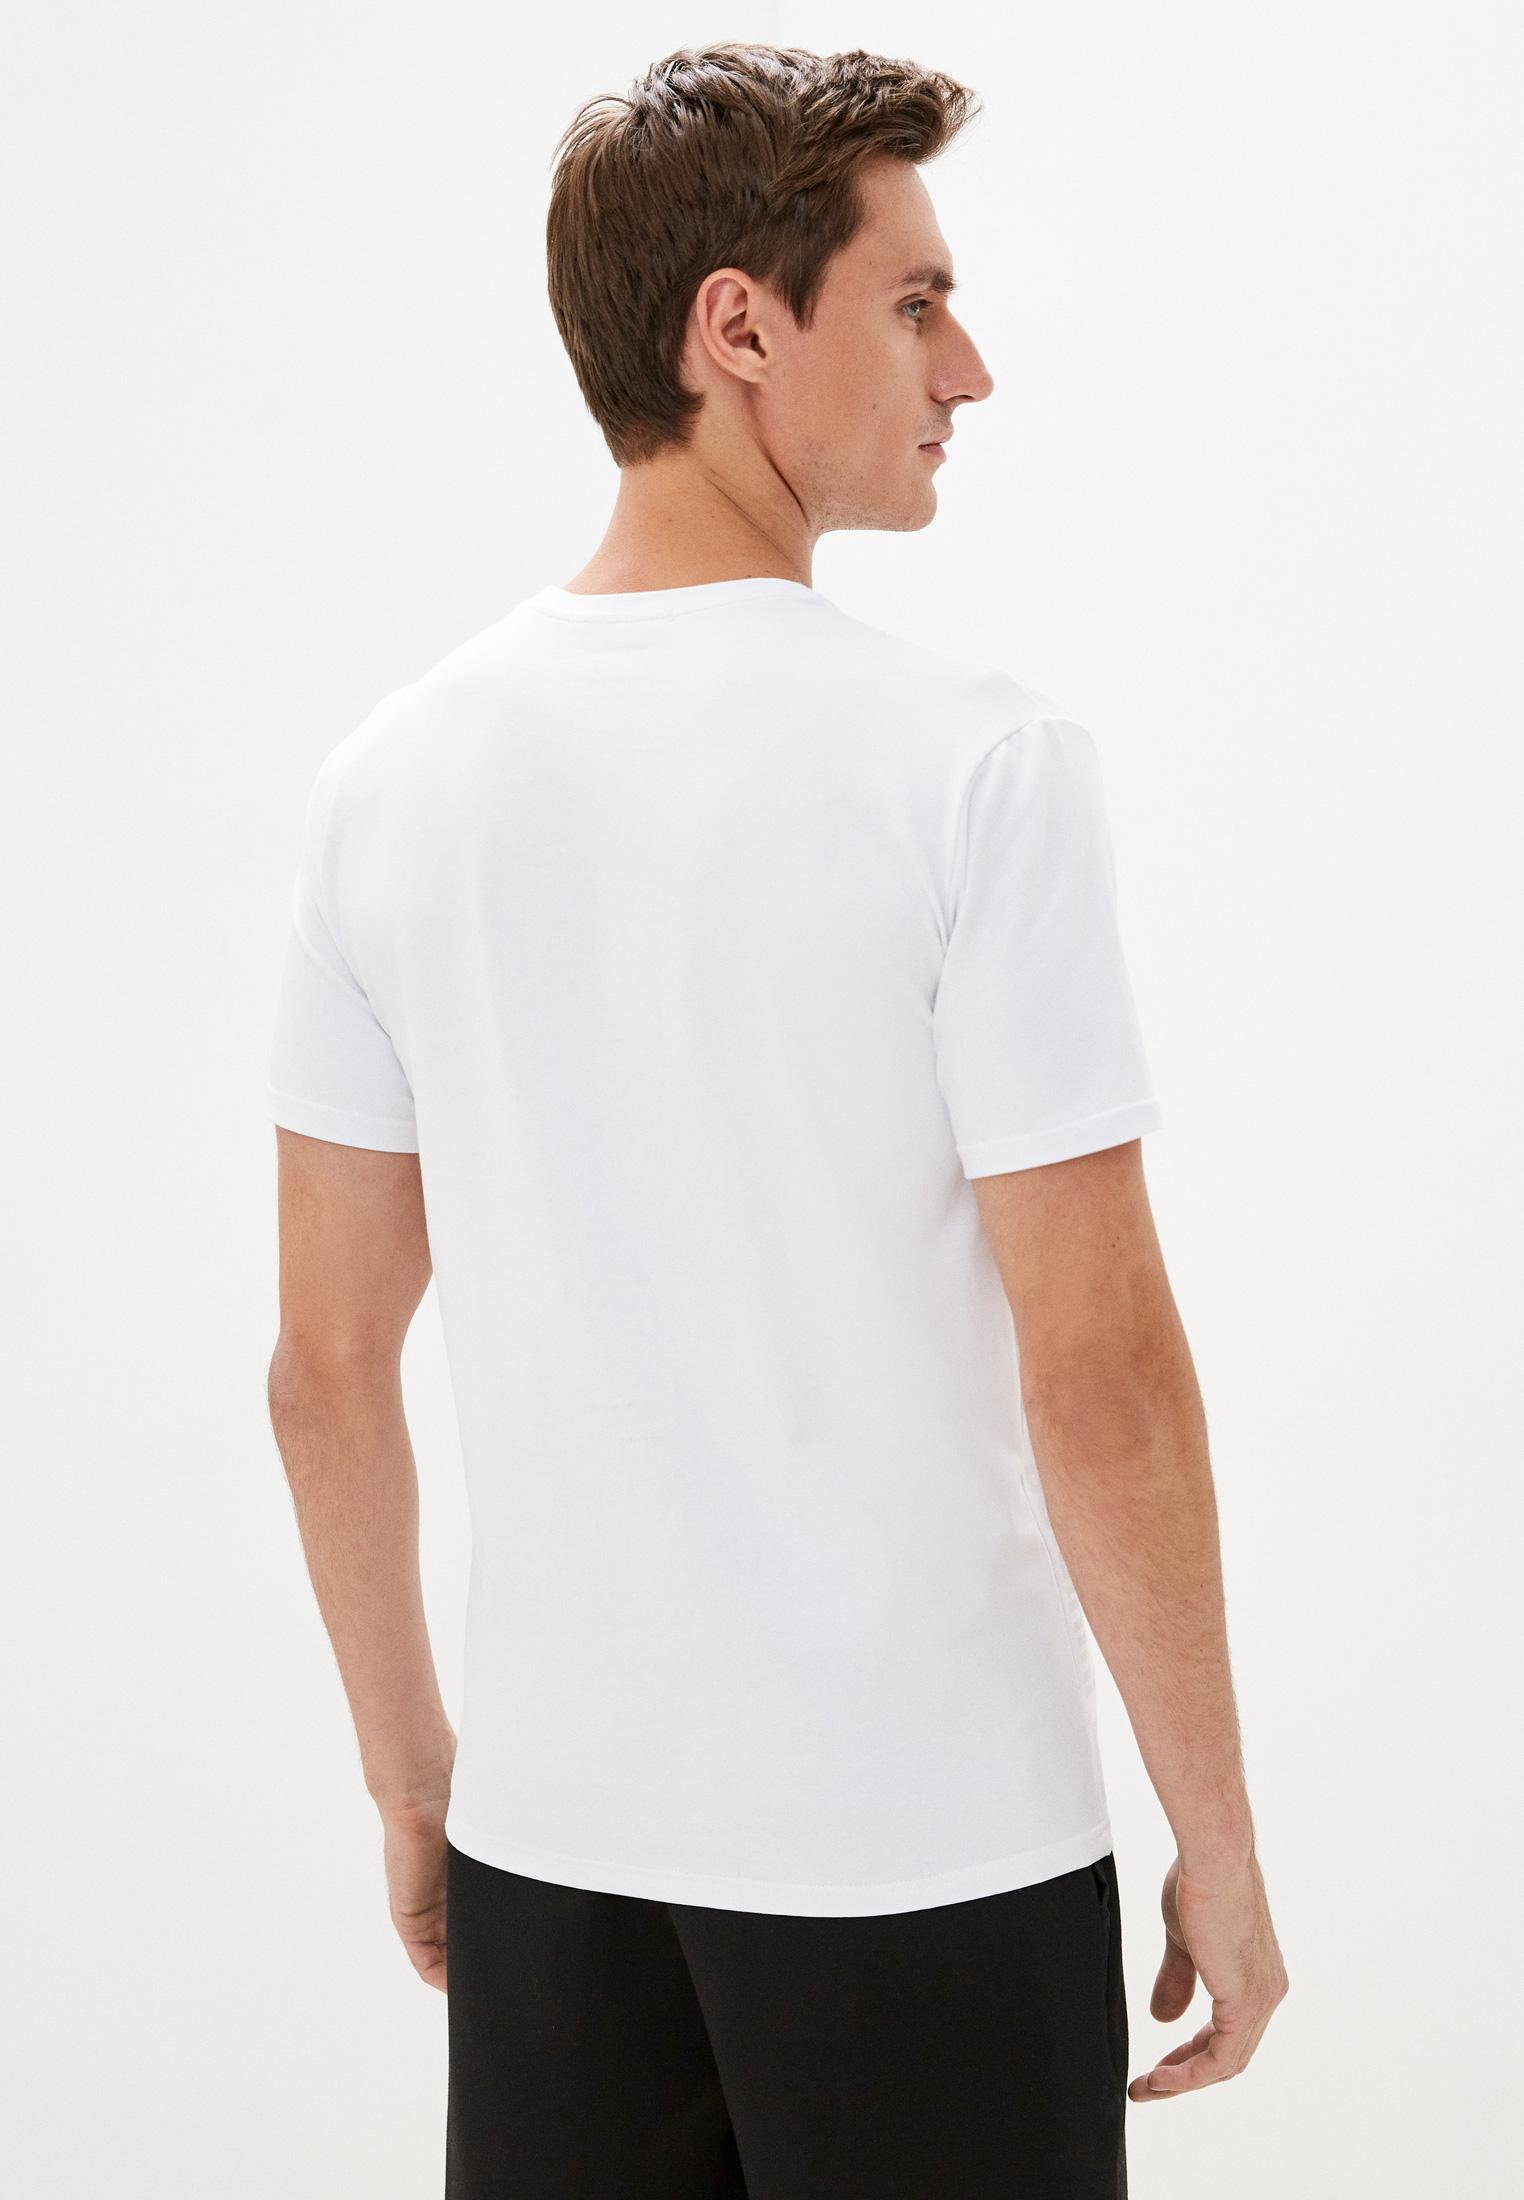 Мужская футболка Baldinini (Балдинини) TSU04: изображение 4